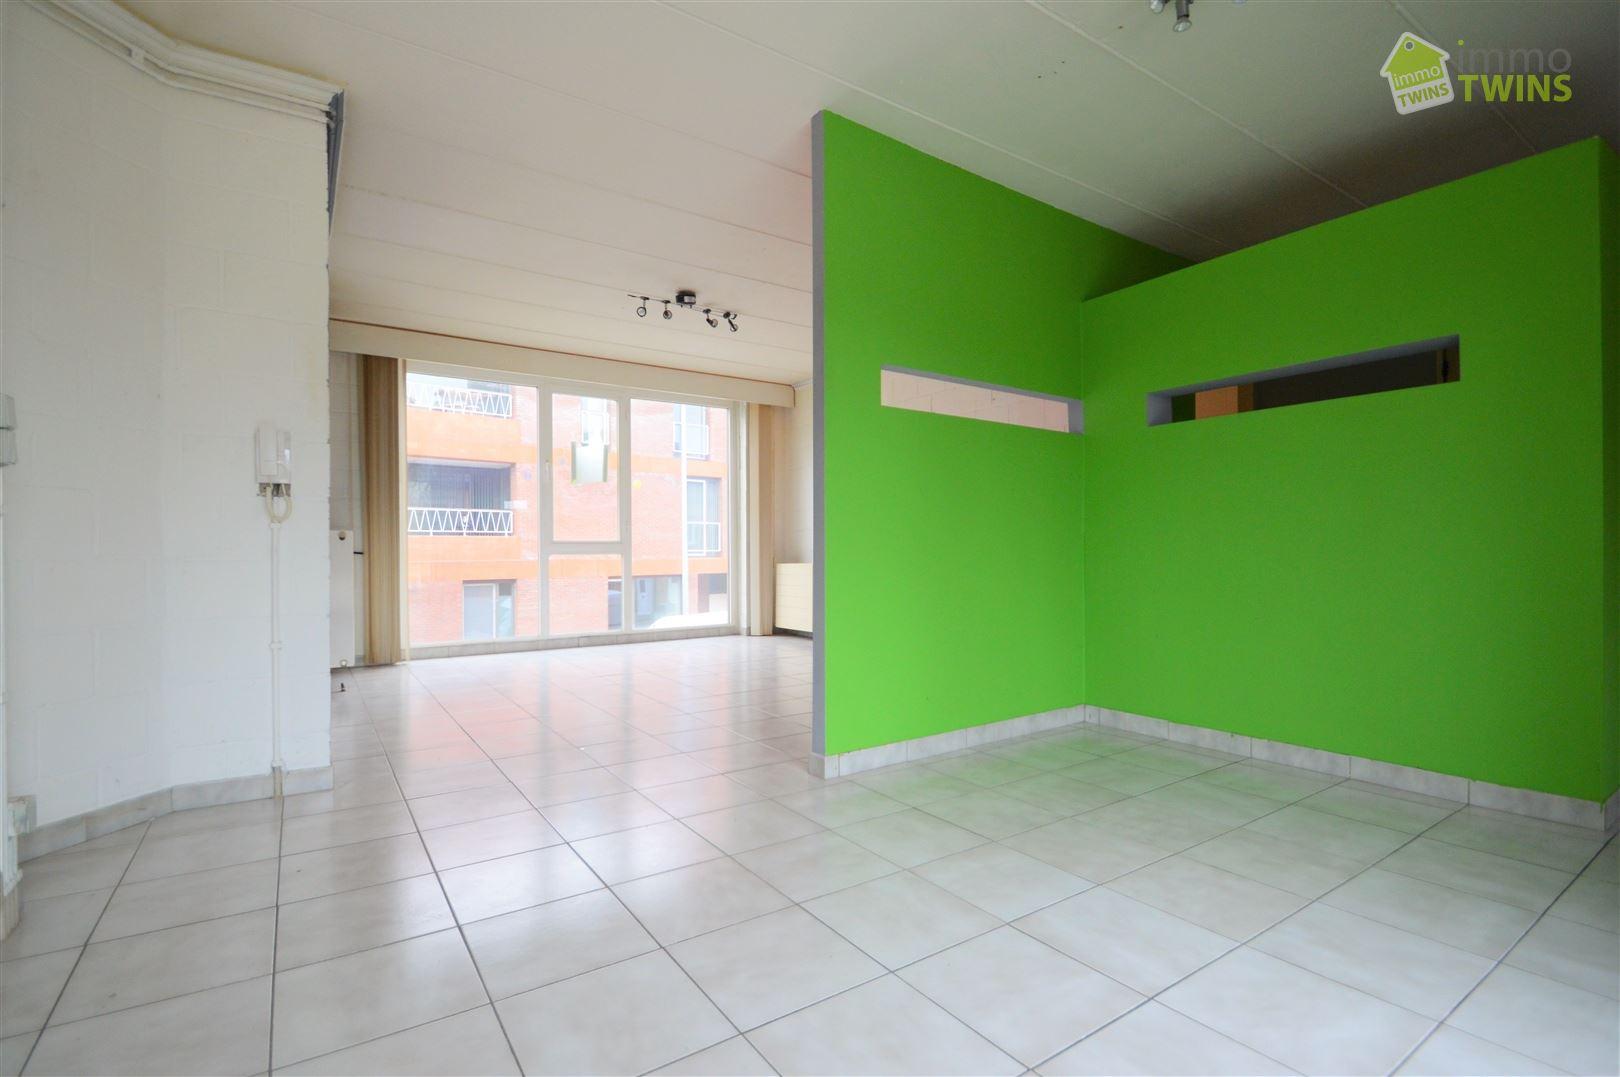 Foto 2 : Appartement te 9200 SINT-GILLIS-DENDERMONDE (België) - Prijs € 535